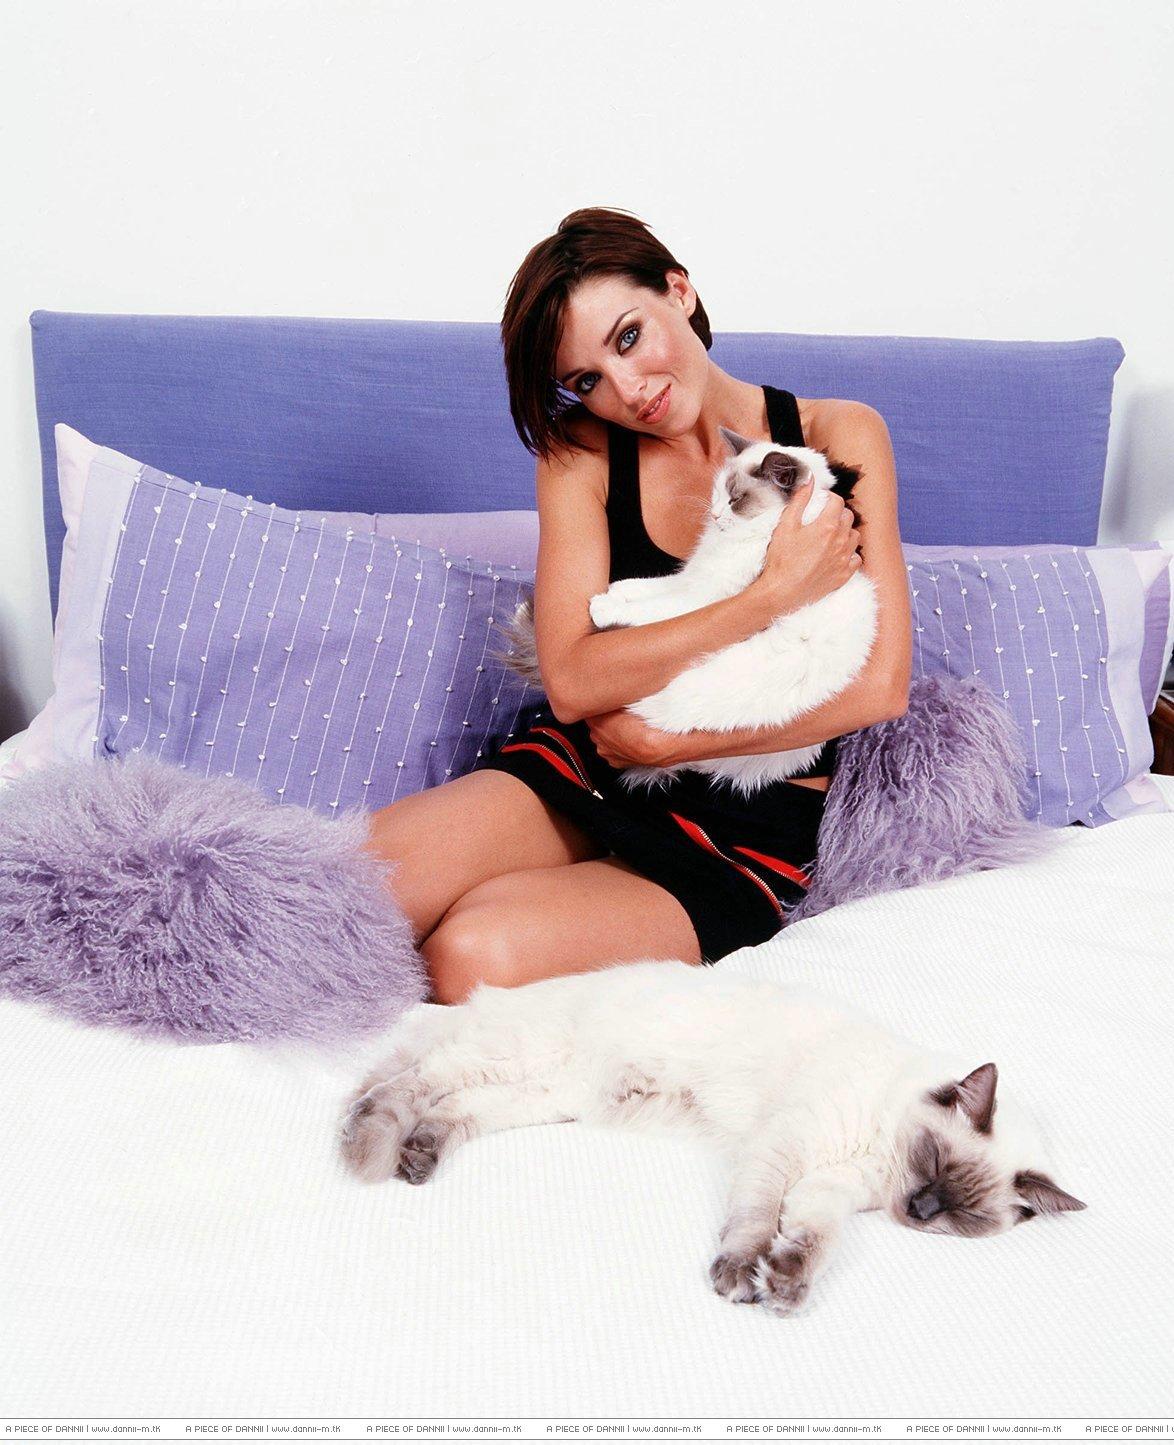 http://2.bp.blogspot.com/-J9_v1CpCrUA/ULUisCL46iI/AAAAAAAASAo/ViJTNCpKTdU/s1600/Danni_Minogue20.jpg